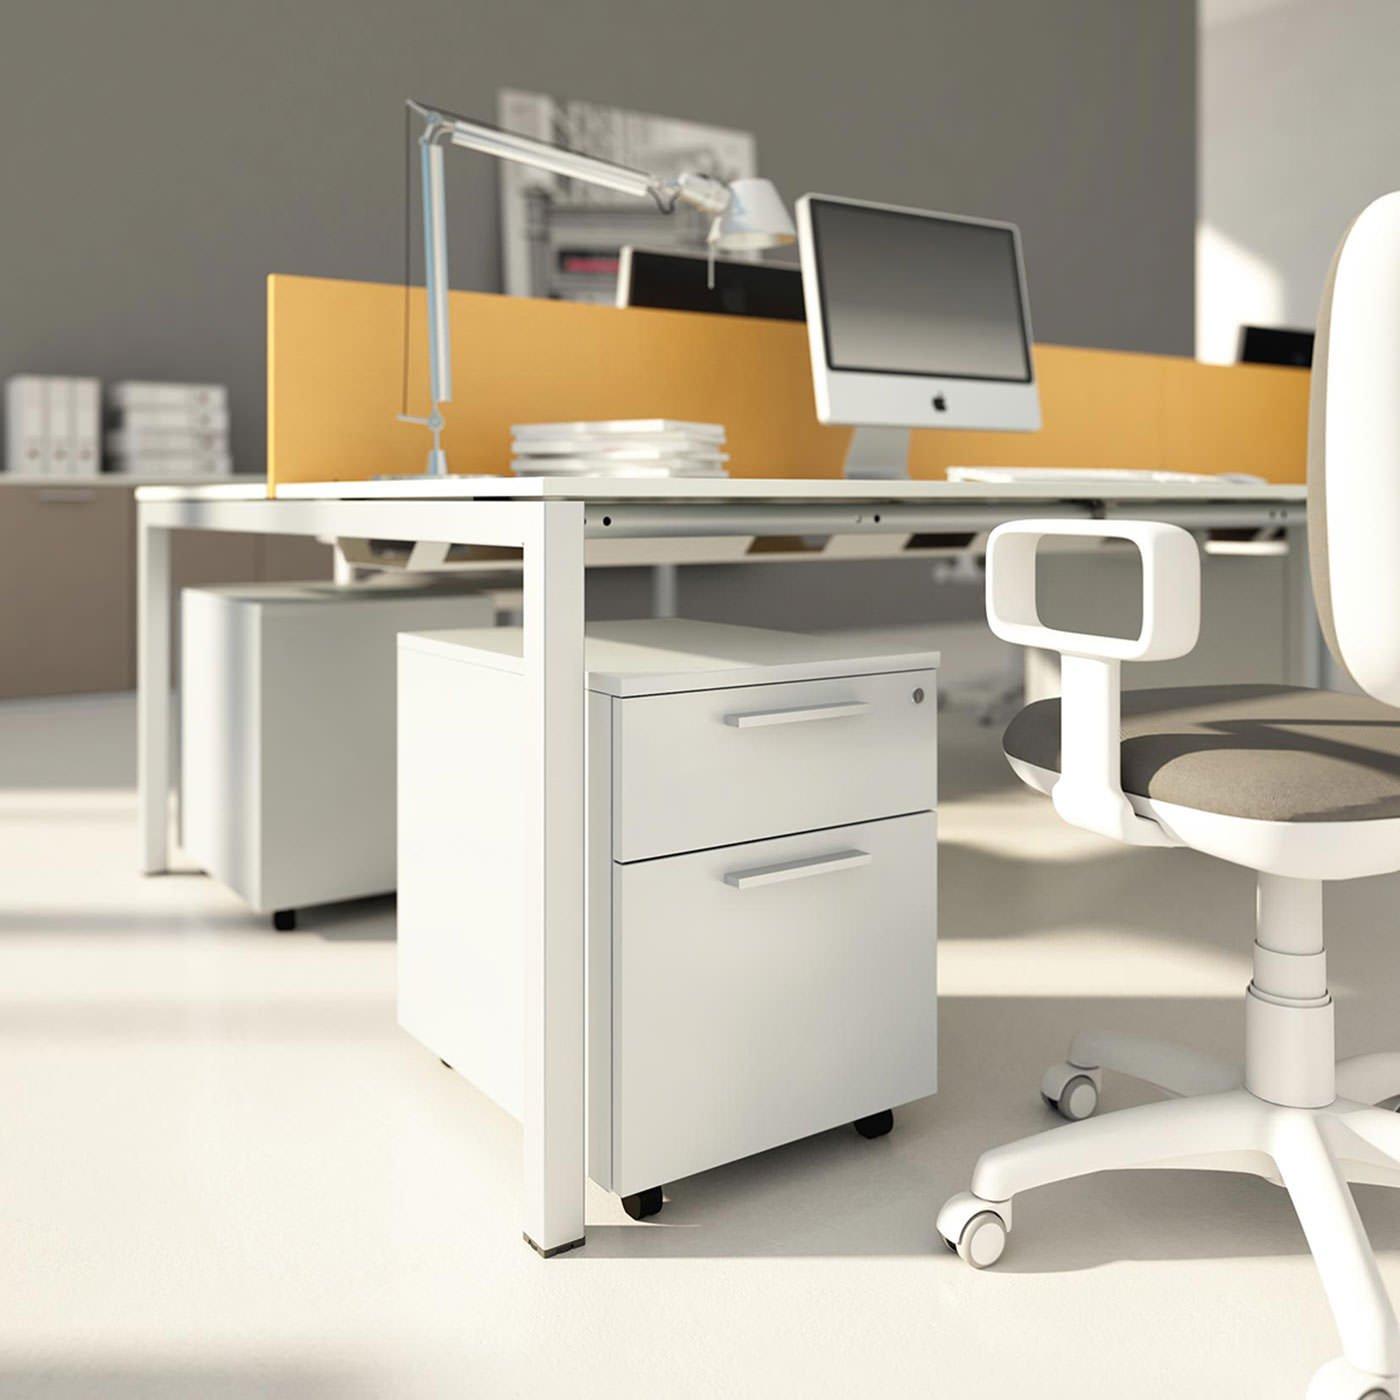 Mobili per ufficio lego - IVM Office : IVM Office